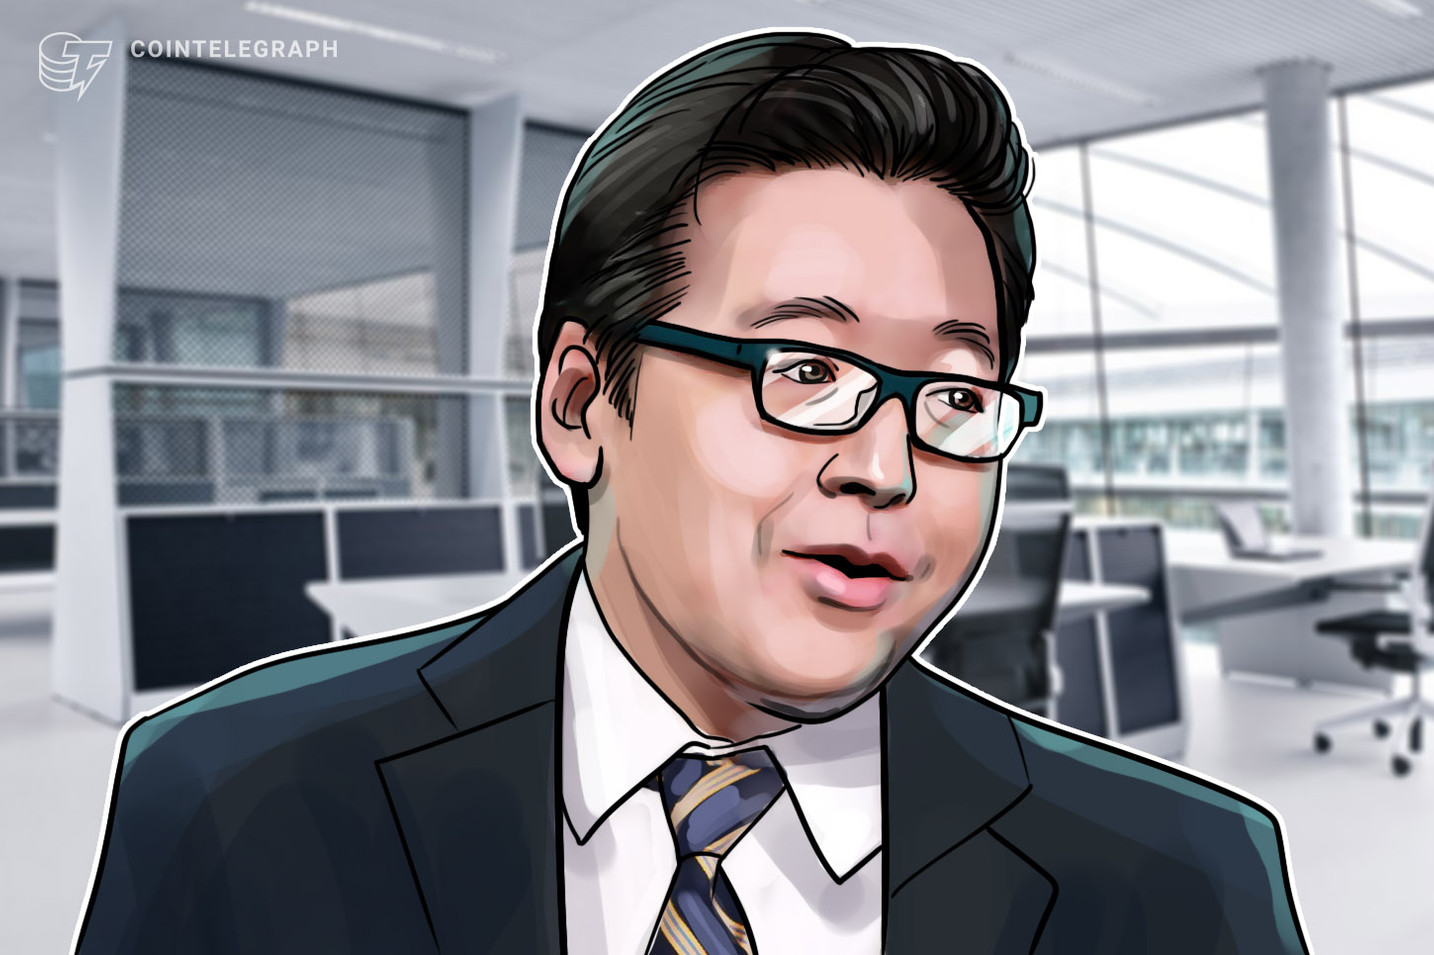 Cofundador de Fundstrat Global Advisors, Thomas Lee: Bitcoin está de vuelta en una tendencia alcista